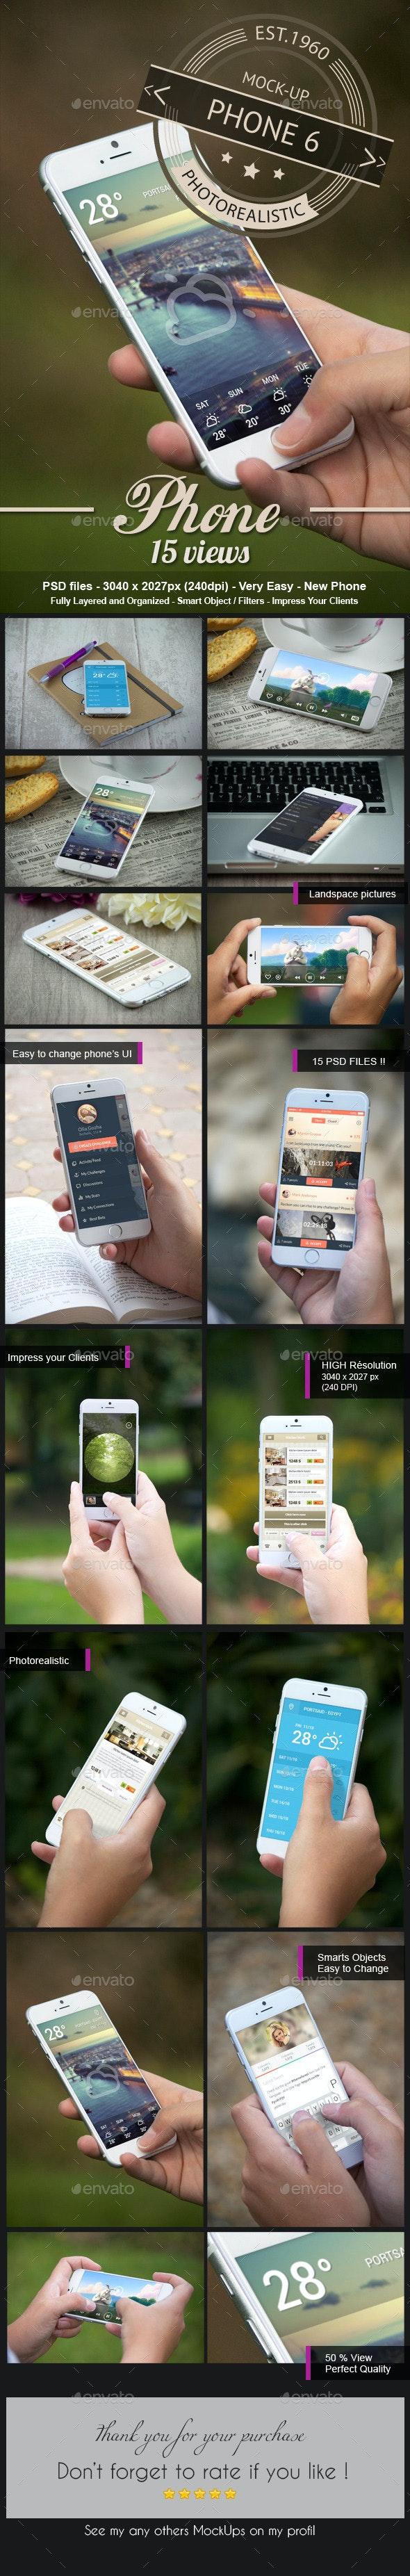 Photorealistic Phone 6 Mock-Up - Mobile Displays